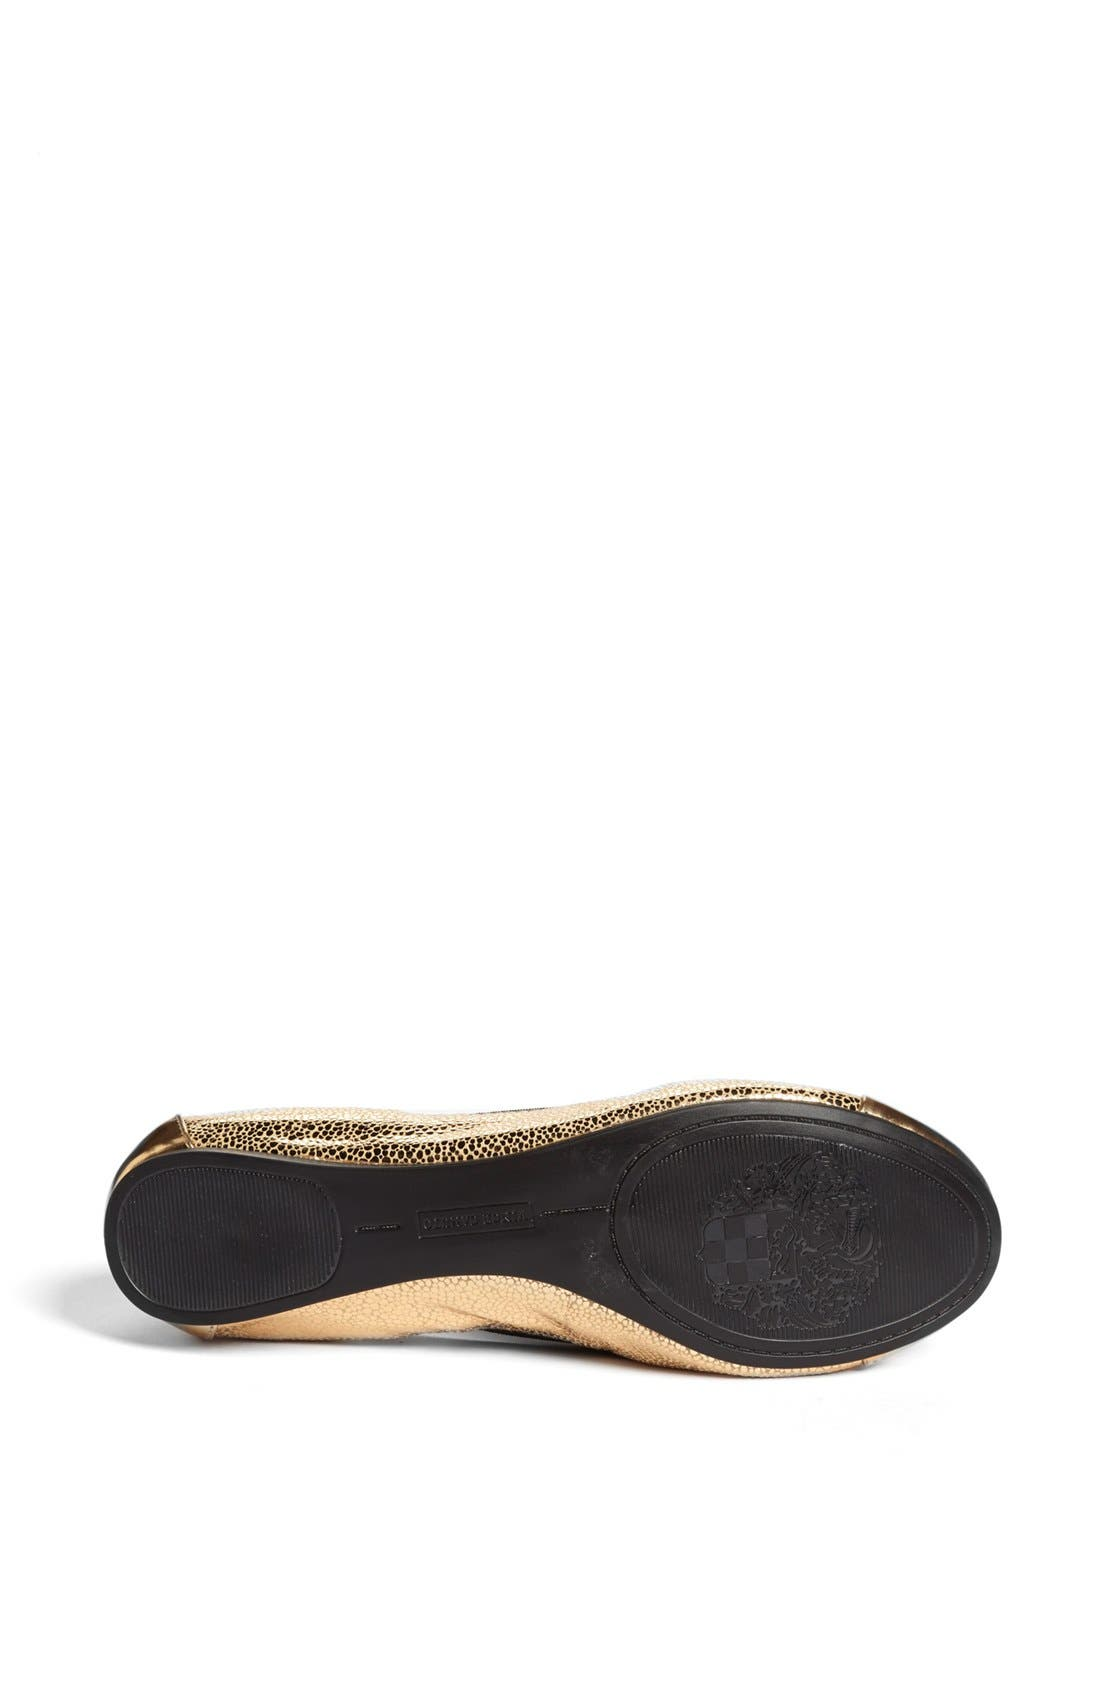 Alternate Image 4  - Vince Camuto 'Elisee' Leather Ballet Flat